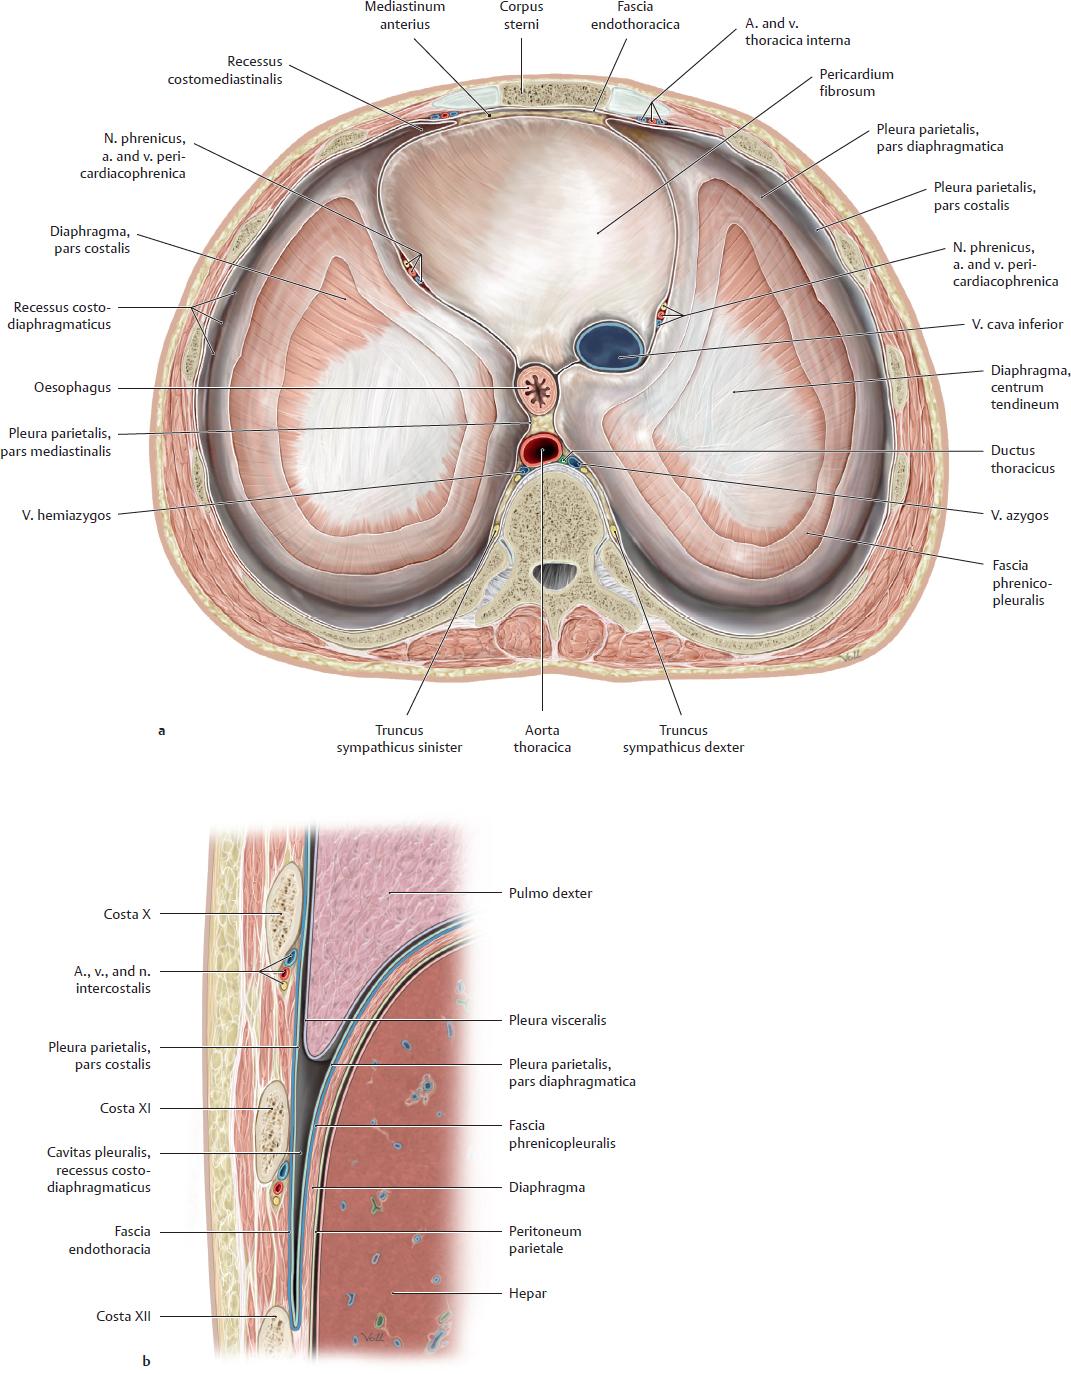 Groß Vertebralis Segmentale Anatomie Fotos - Anatomie Ideen ...